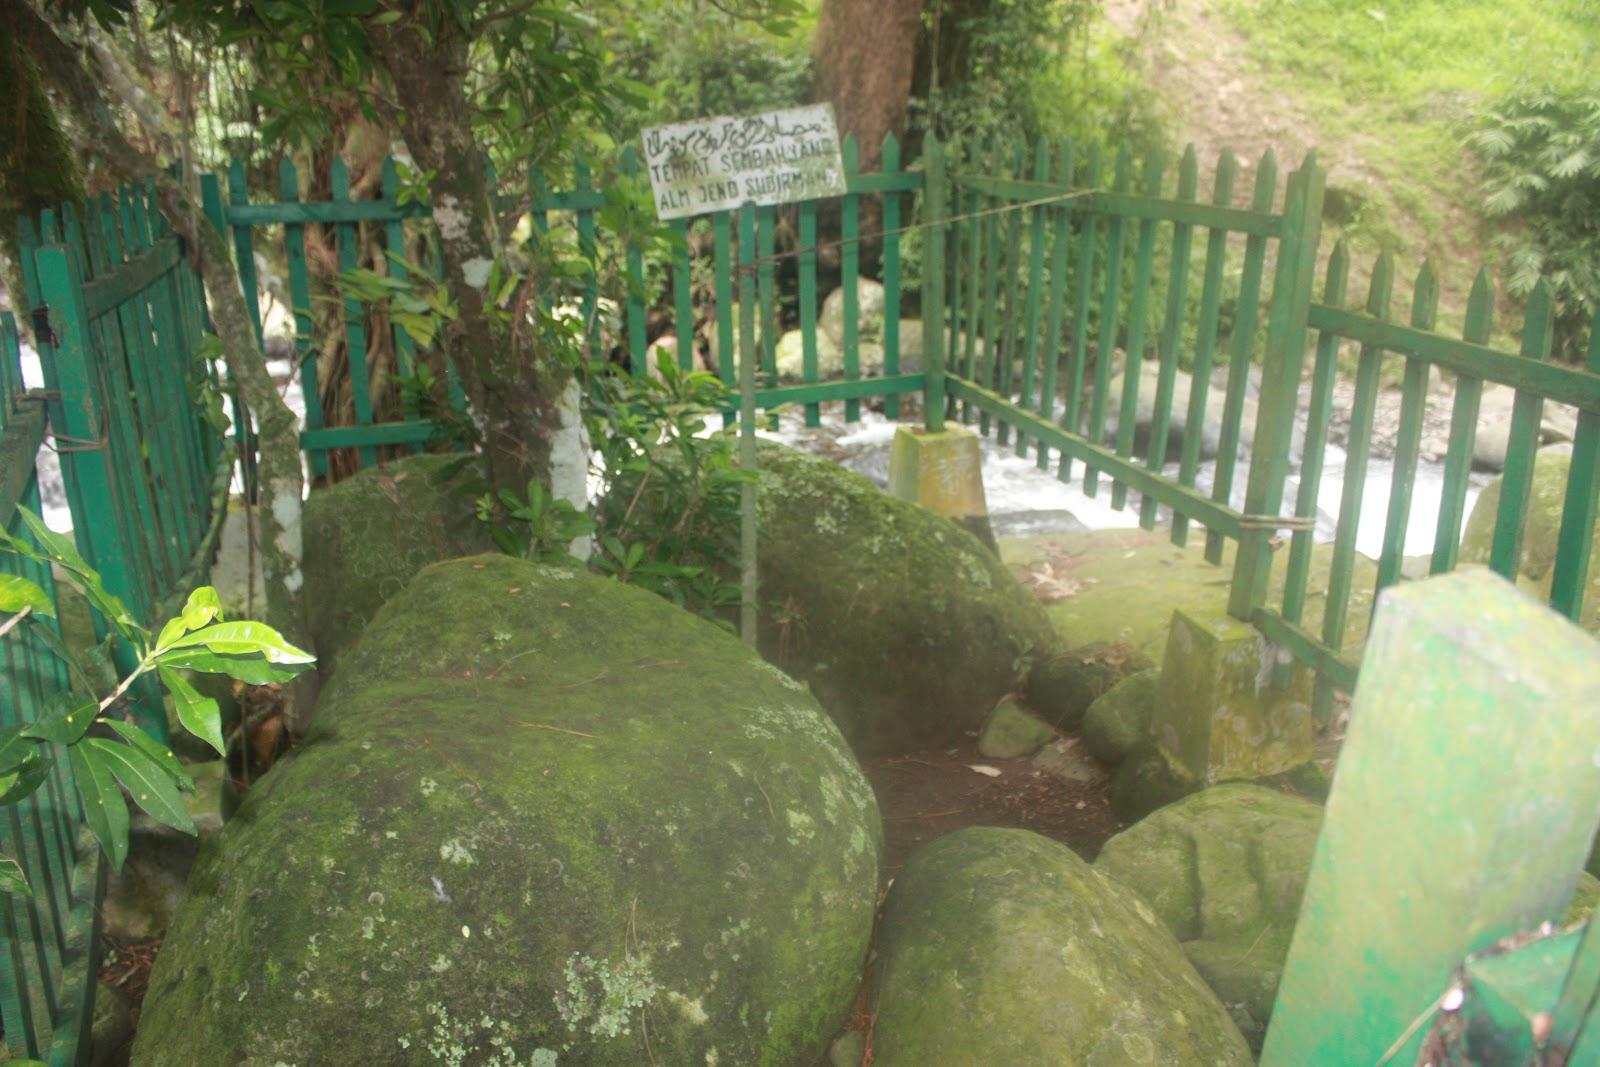 Information Internet Tempat Ibadah Jendral Sudirman Monumen Geriliya Jenderal Kab